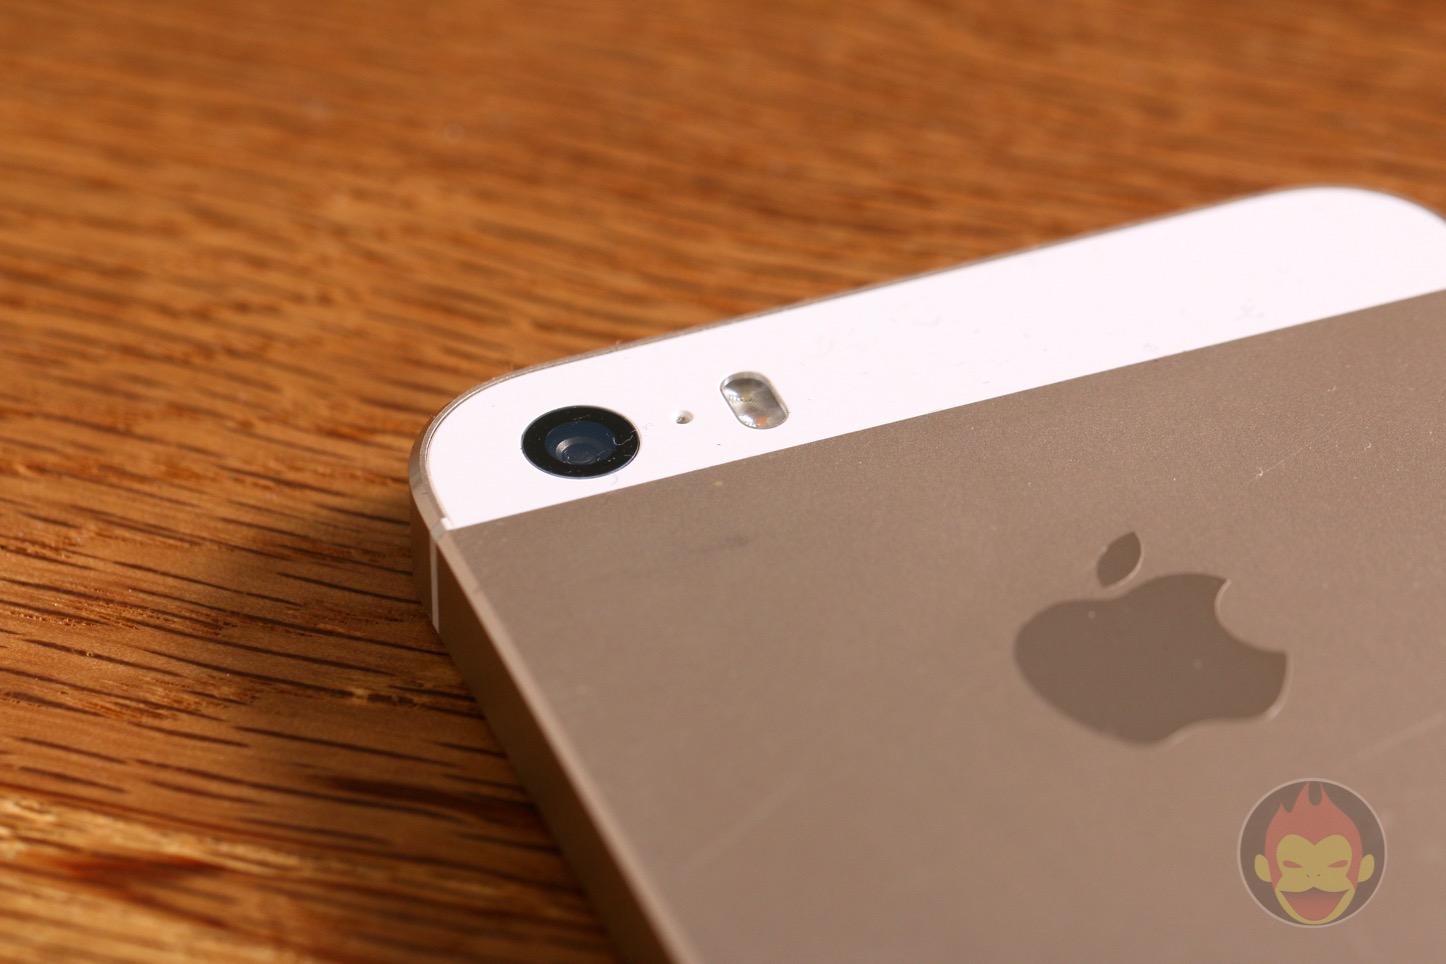 iPhone-5s-Photo-Camera-01.JPG